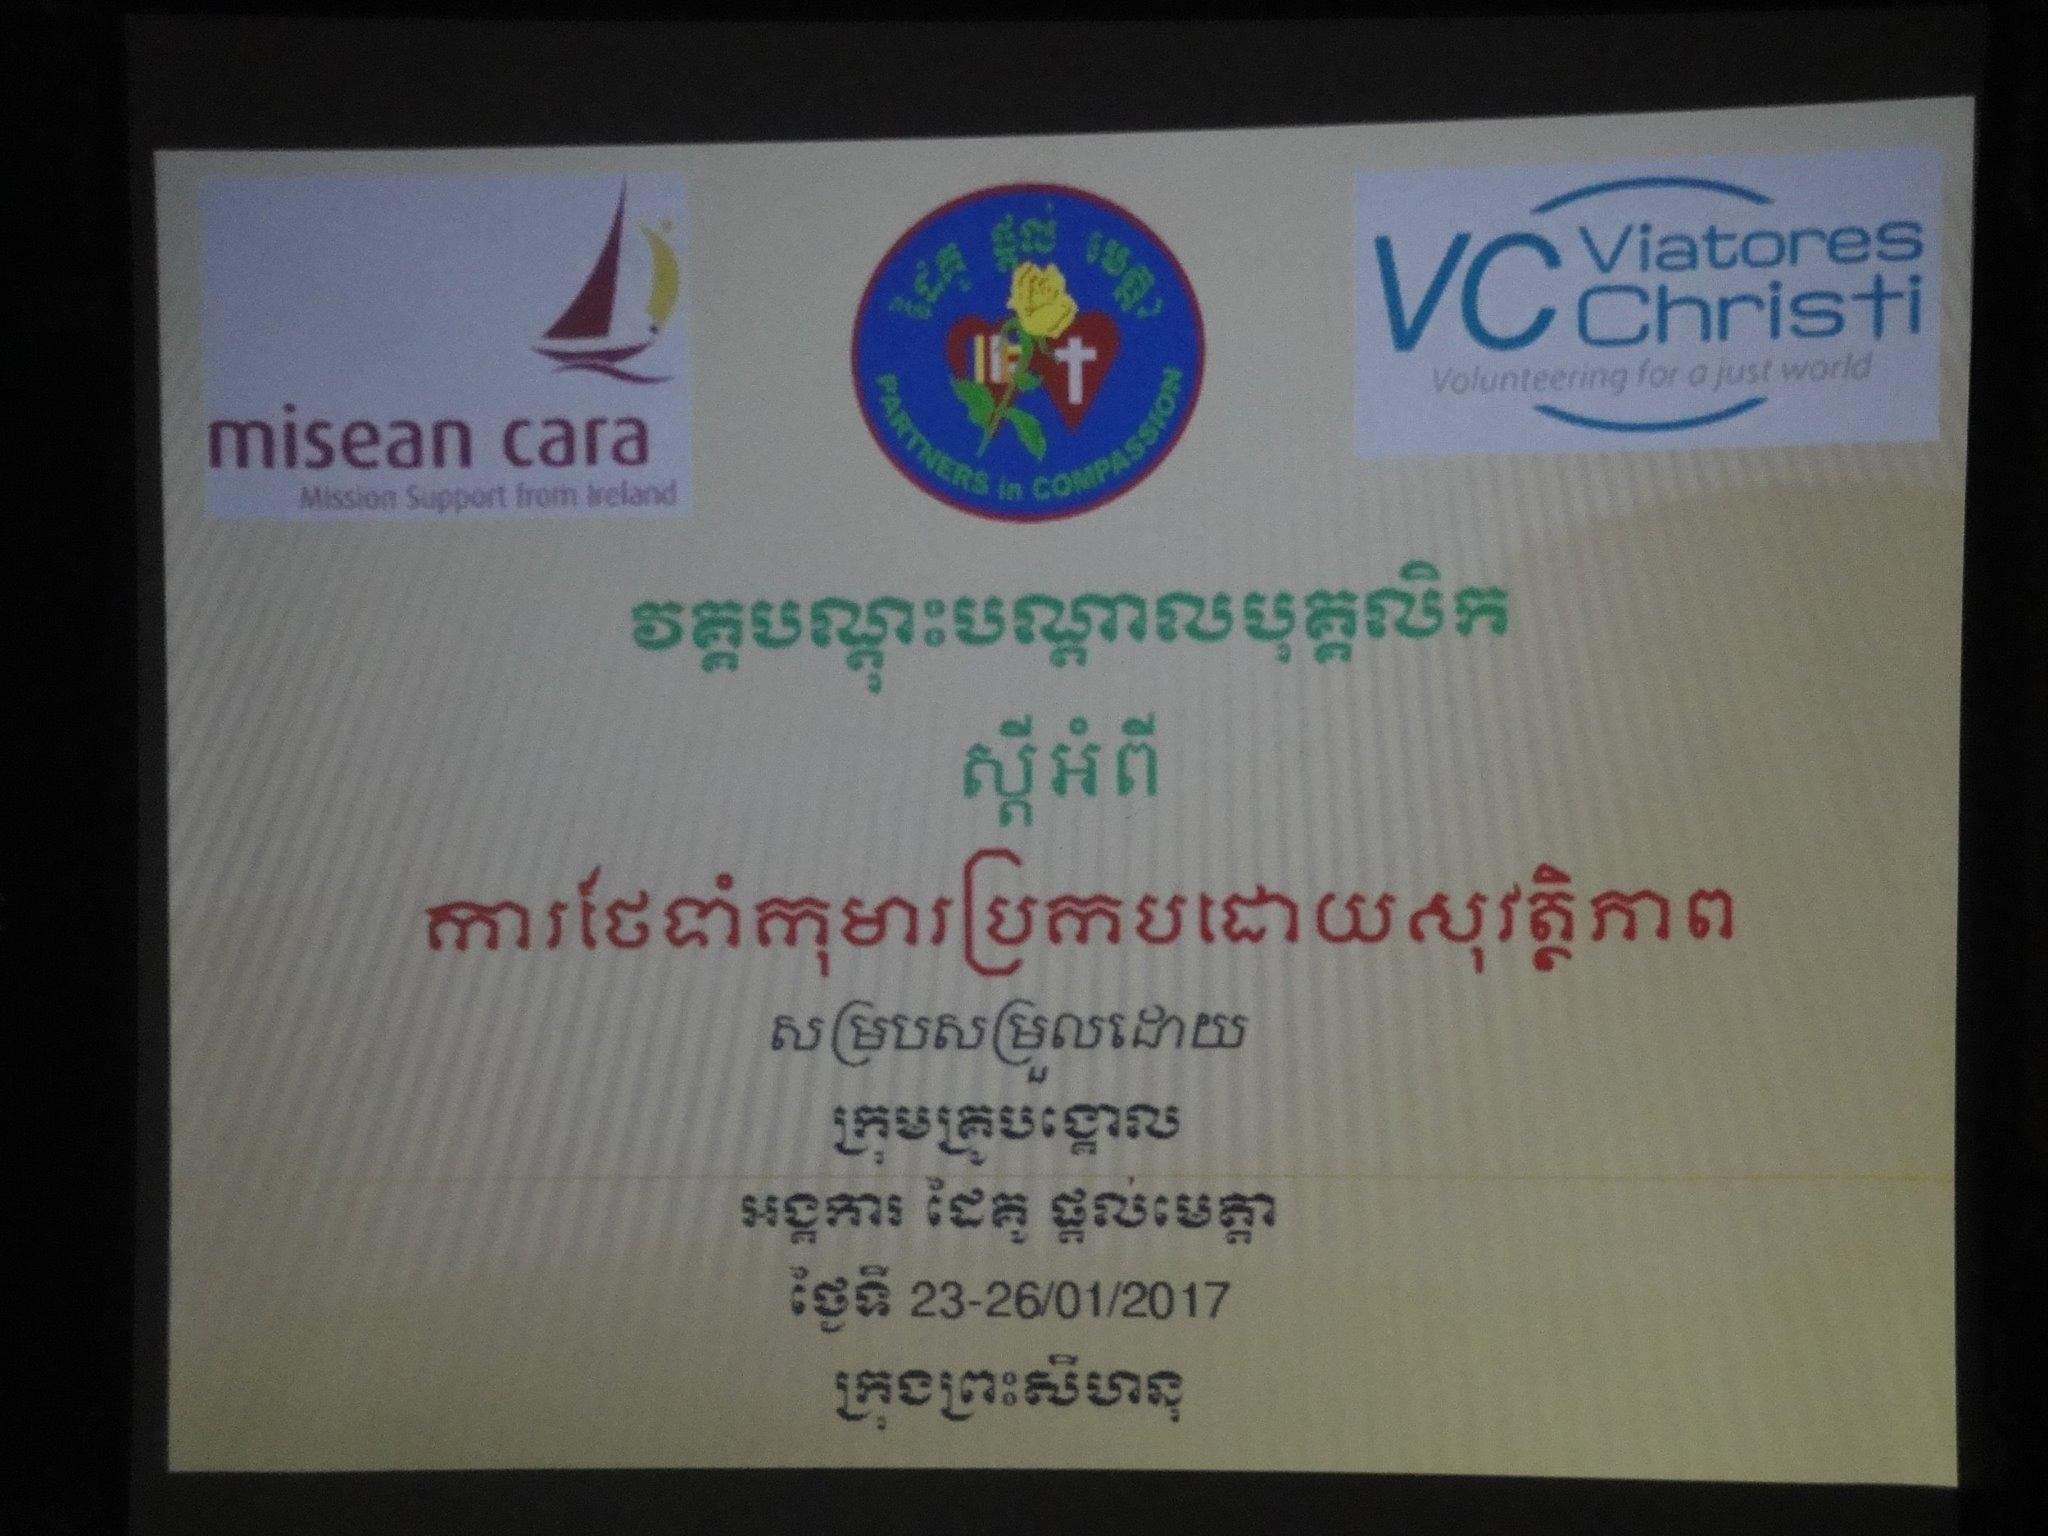 Patrick Mooney – Cambodia